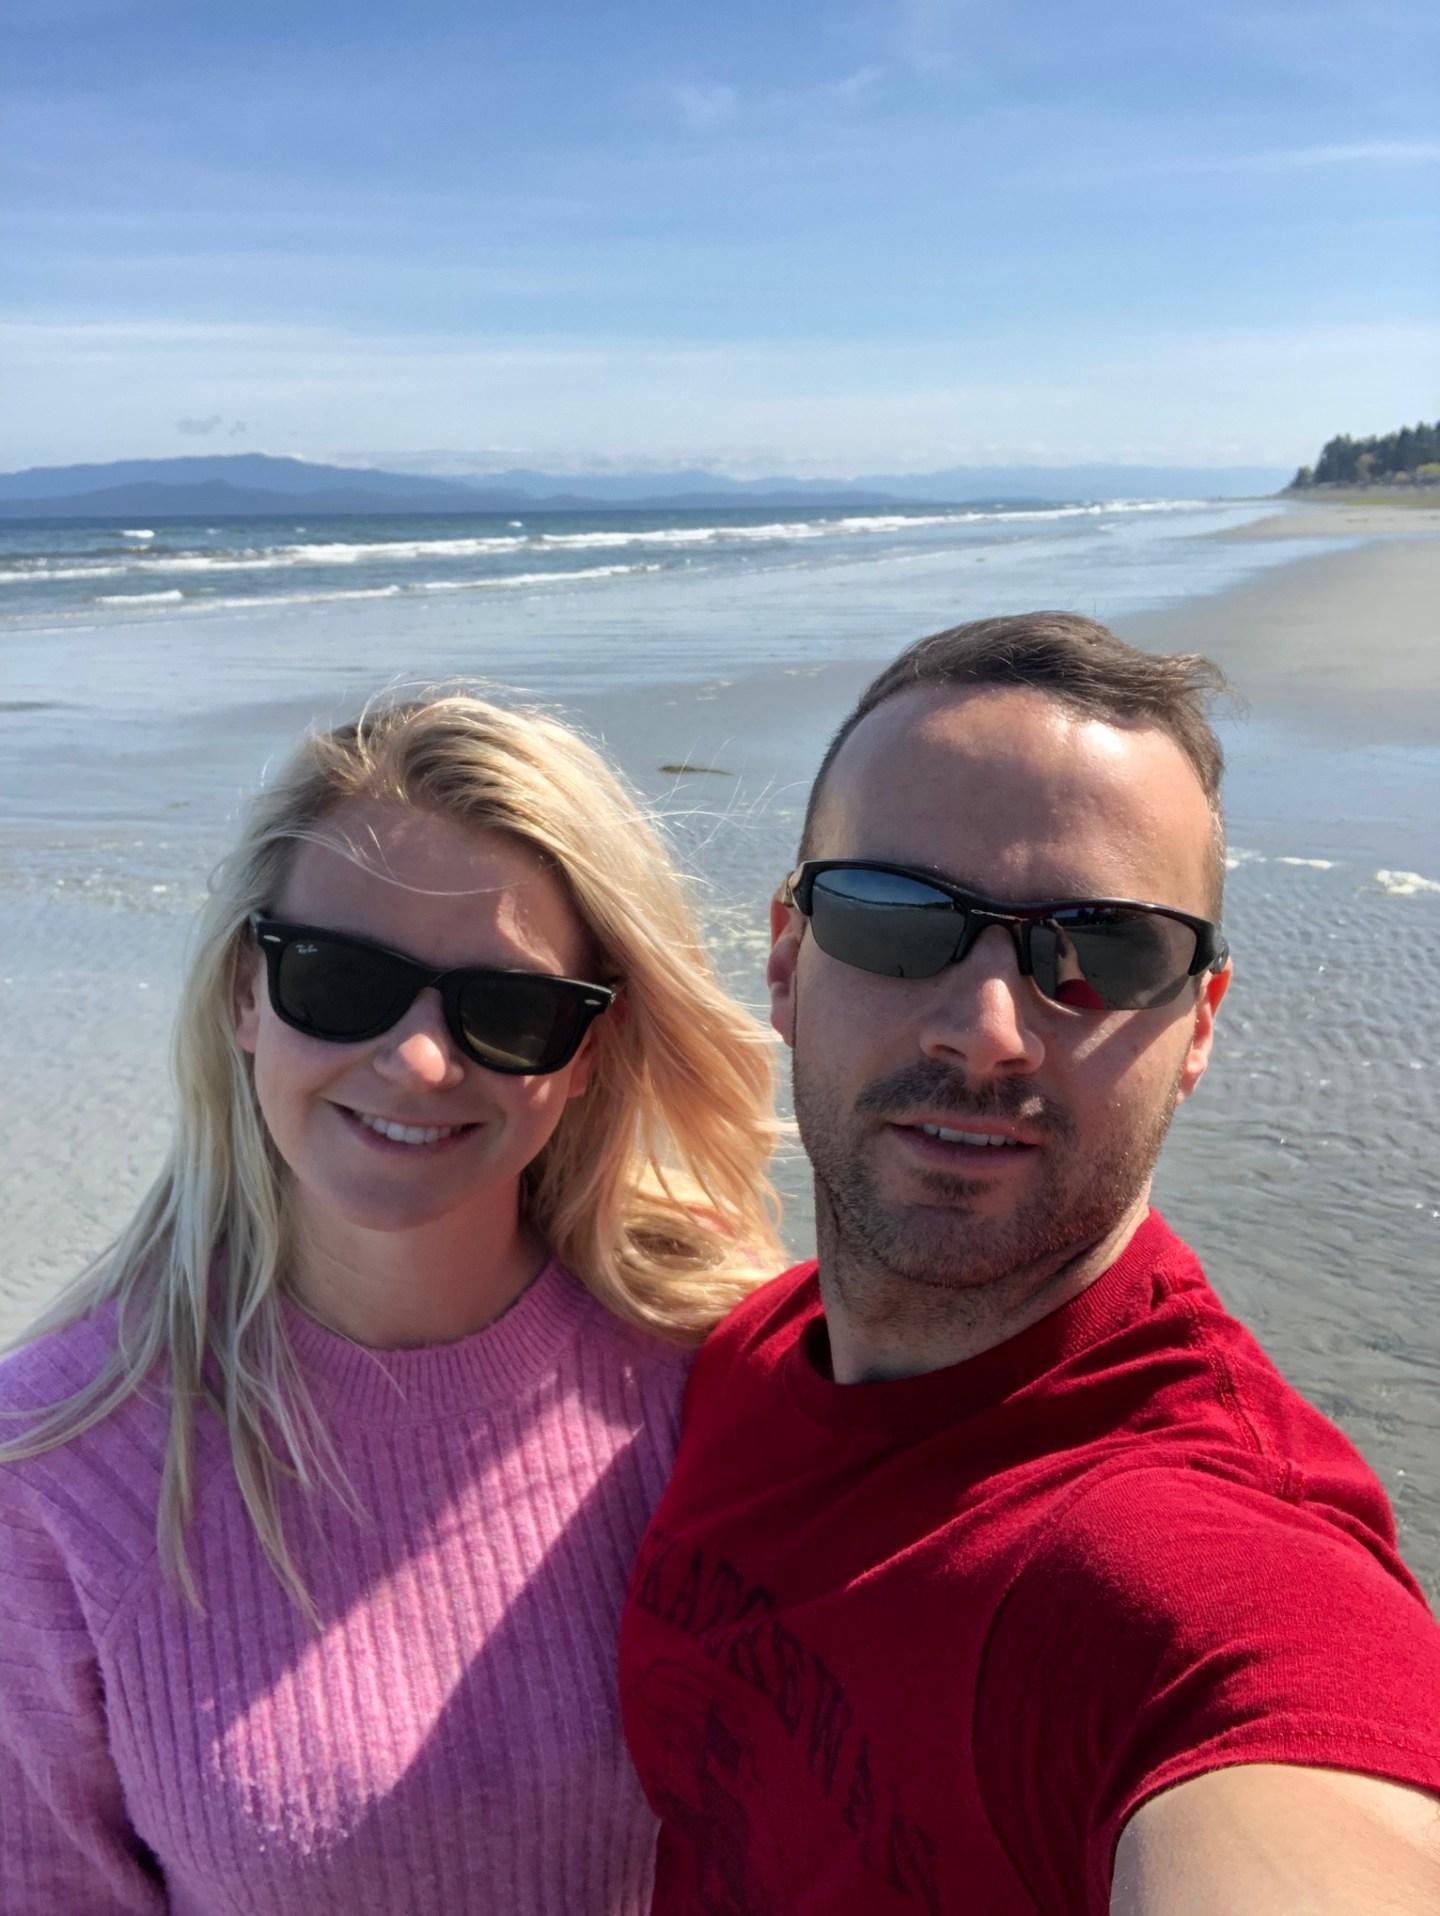 Couple on Qualicum Beach, near Parksville